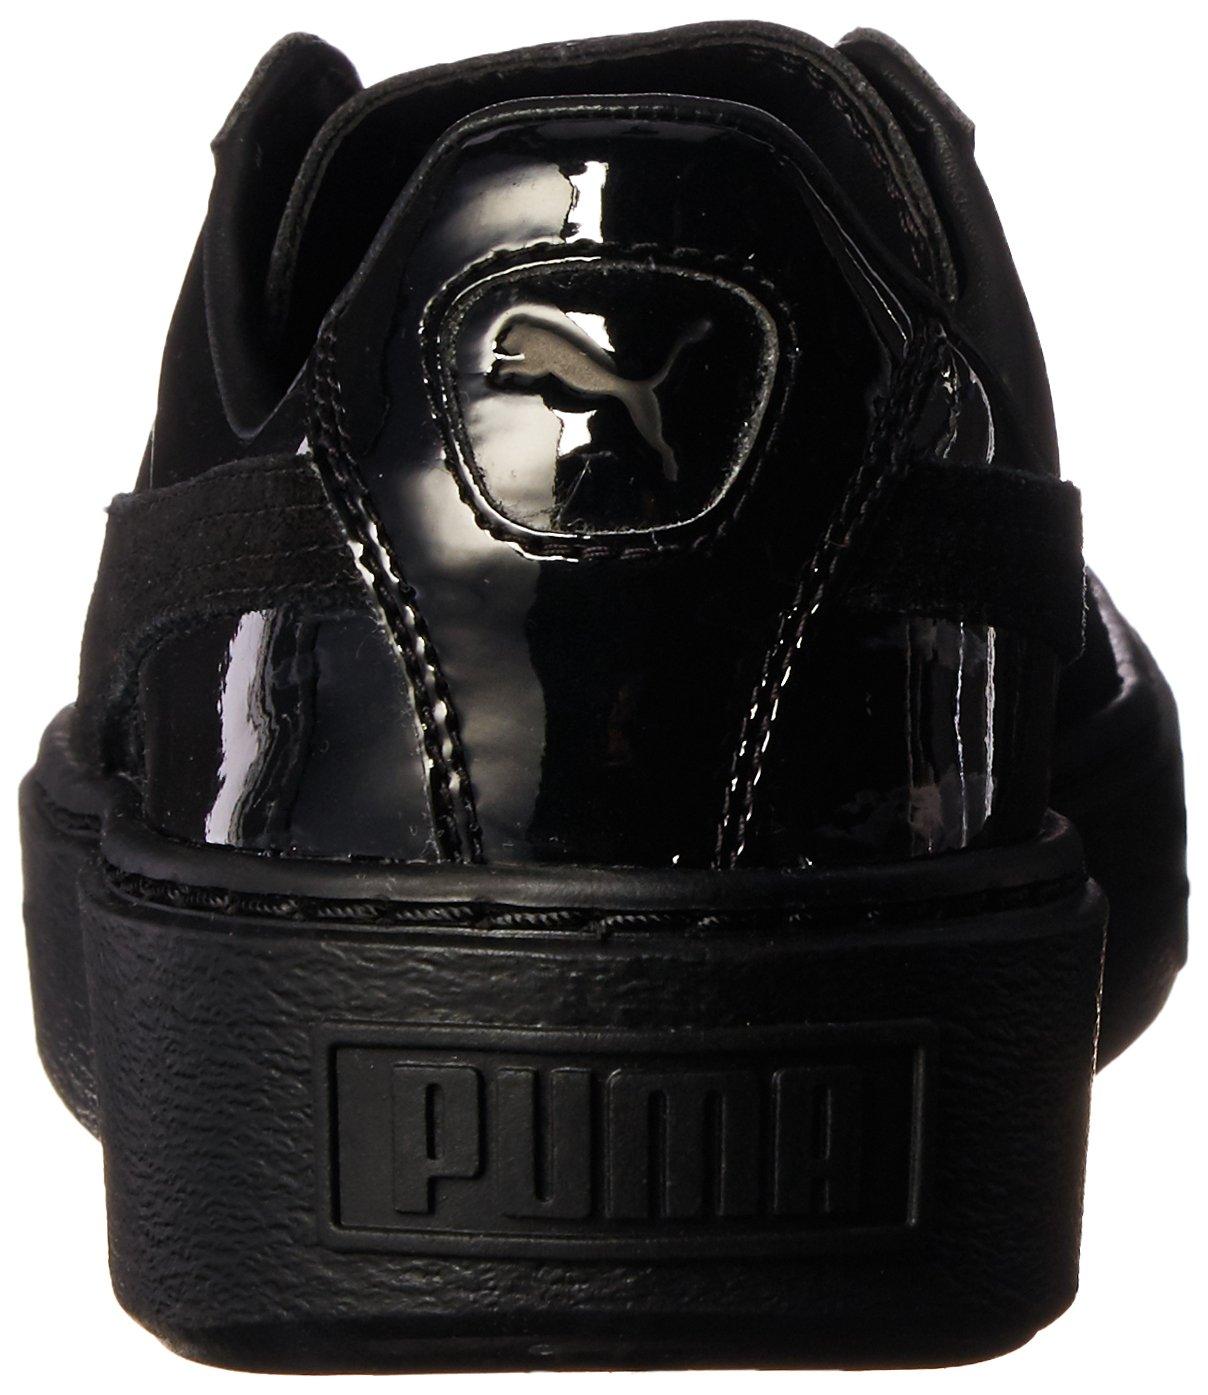 PUMA Women's Basket Platform Patent Fashion Sneaker B01LPWHOZA 8 M US|Puma Black-puma Black